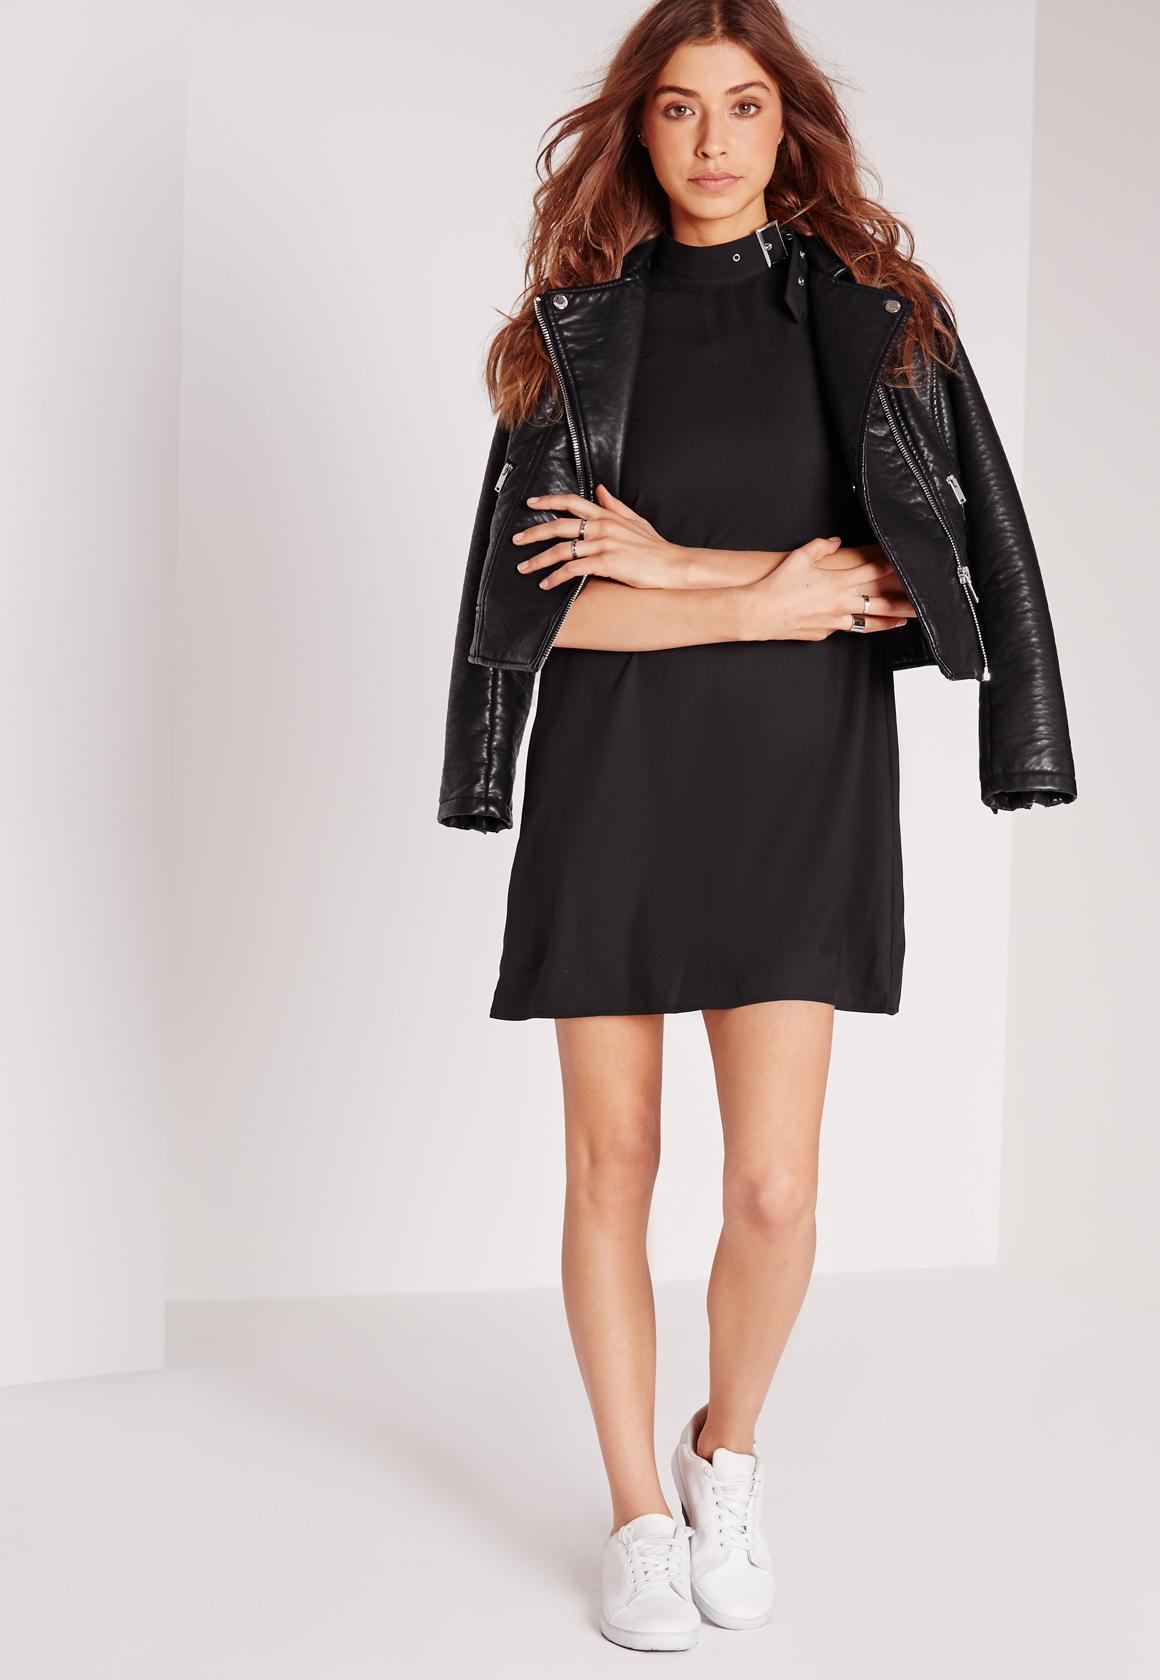 Missguided Buckle Neck Sleeveless Shift Dress Black in Black | Lyst